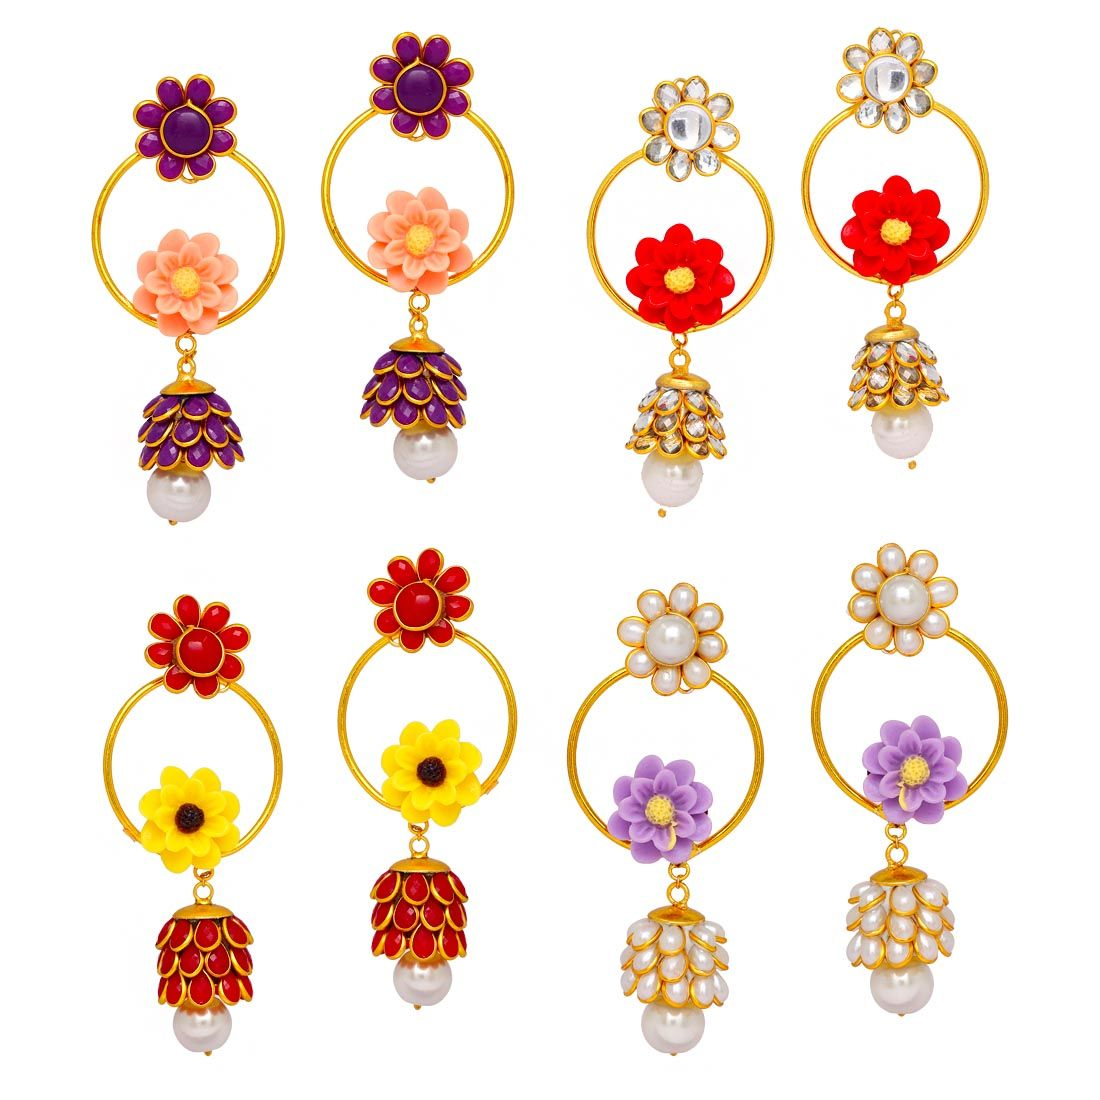 Gold Jhumki Earrings Pair Of 4 Jewellery Gift, jewellery.